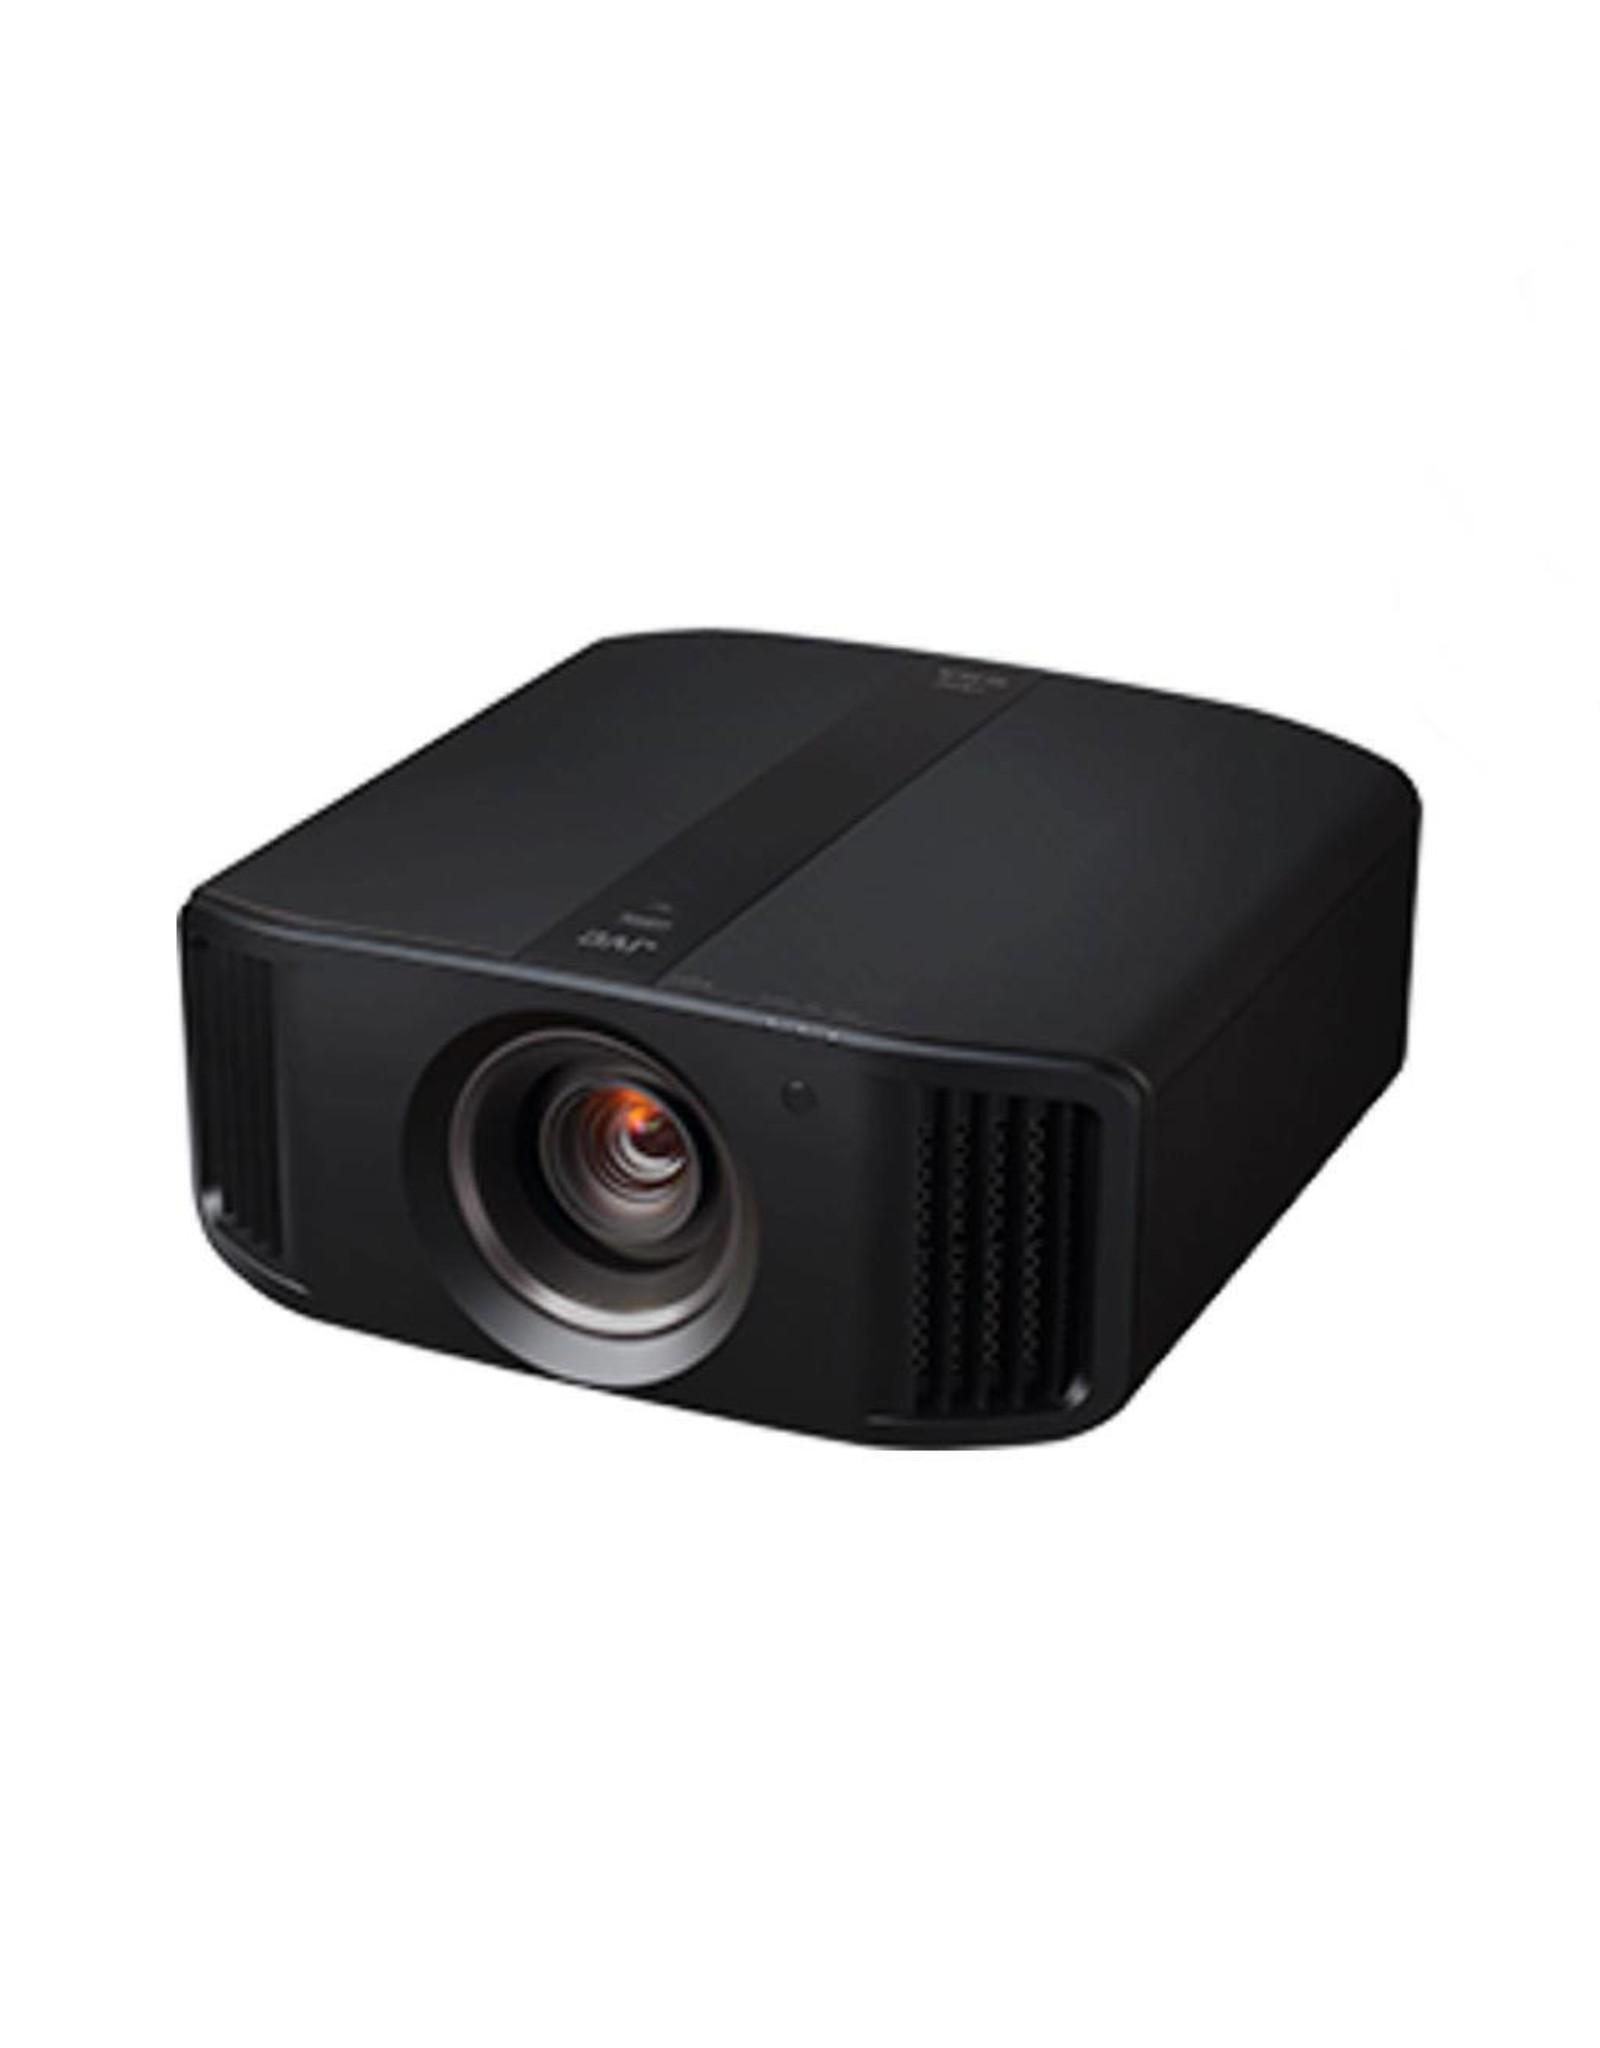 JVC JVC DLA-N5 4K DILA Projector